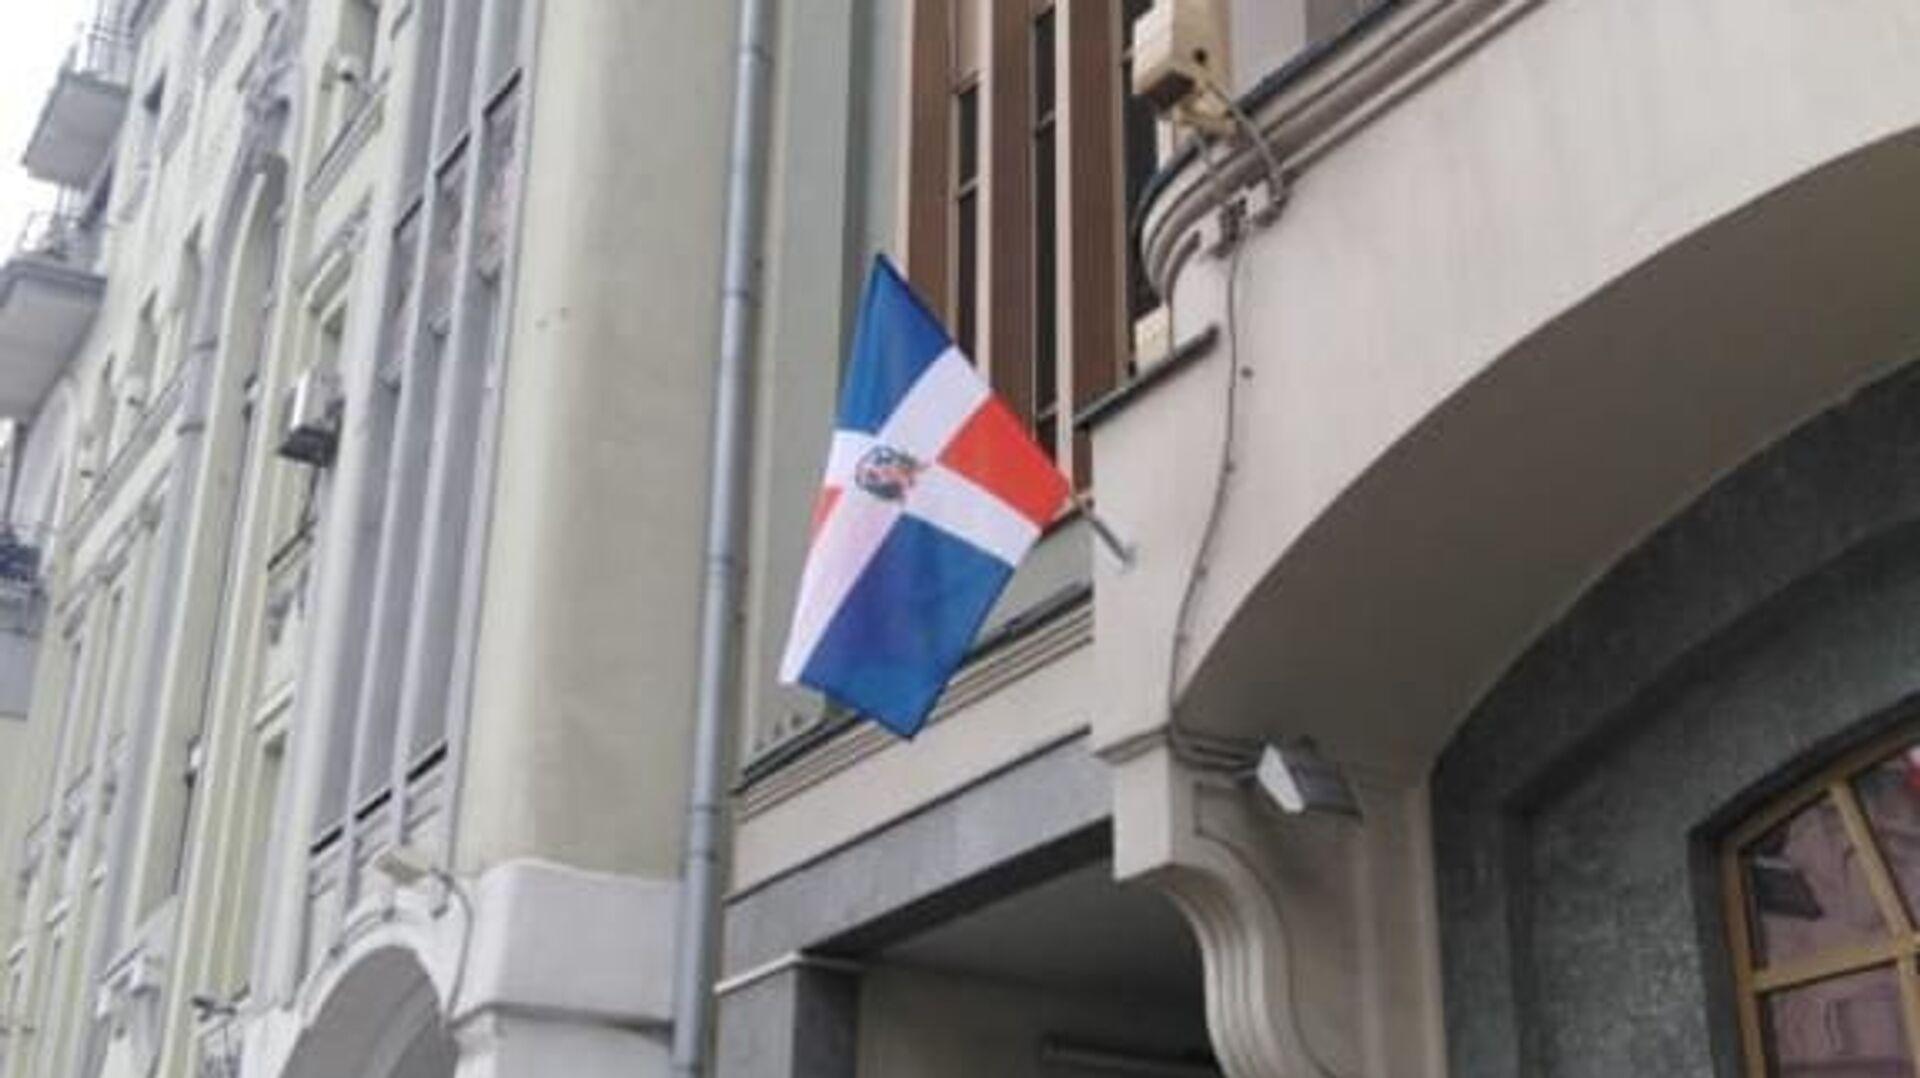 La bandera dominicana en la embajada de la República en Moscú - Sputnik Mundo, 1920, 24.06.2021